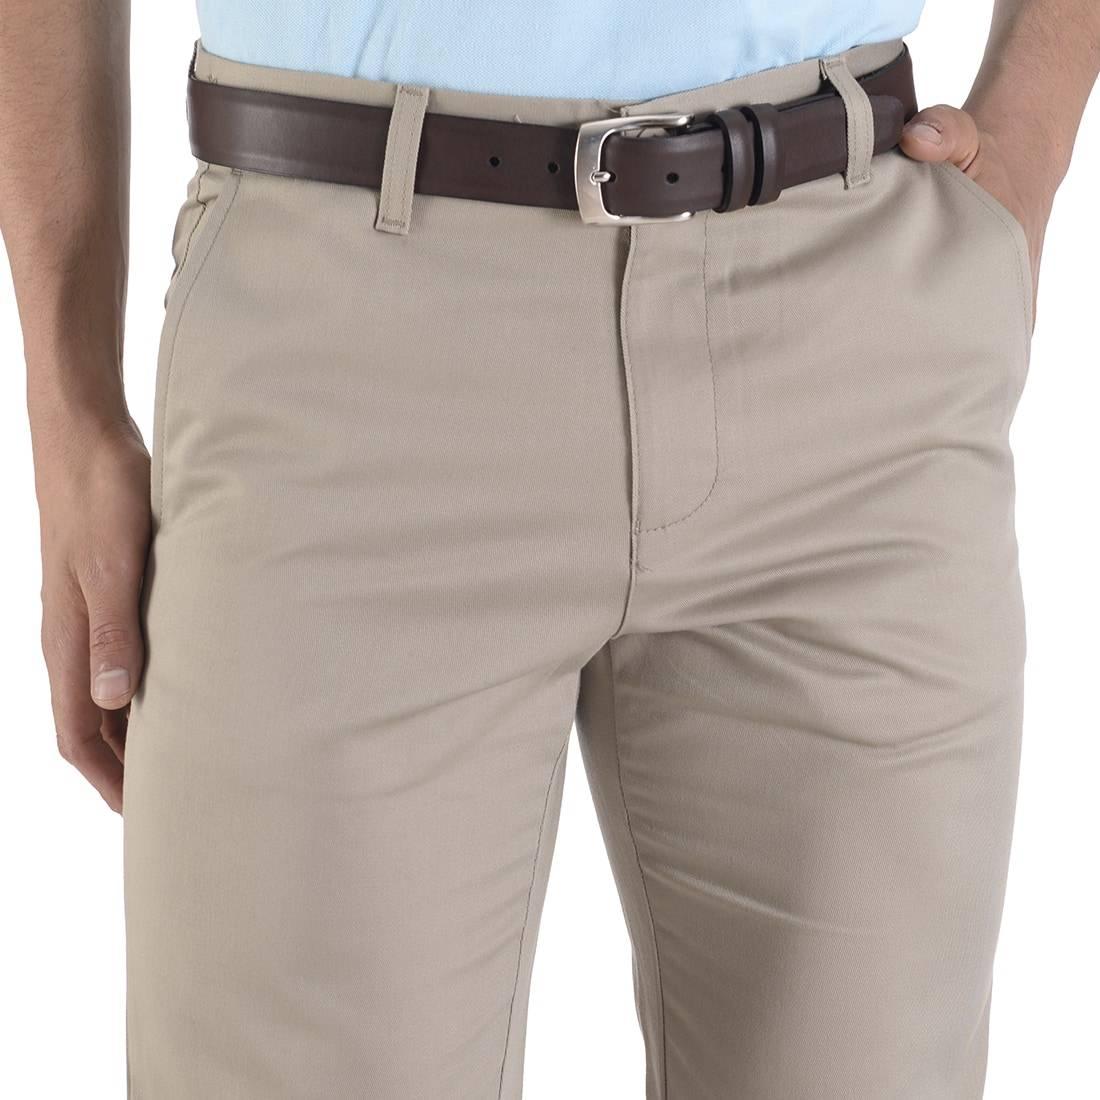 010789055267-03-Pantalon-Casual-Classic-Fit-Beige-yale